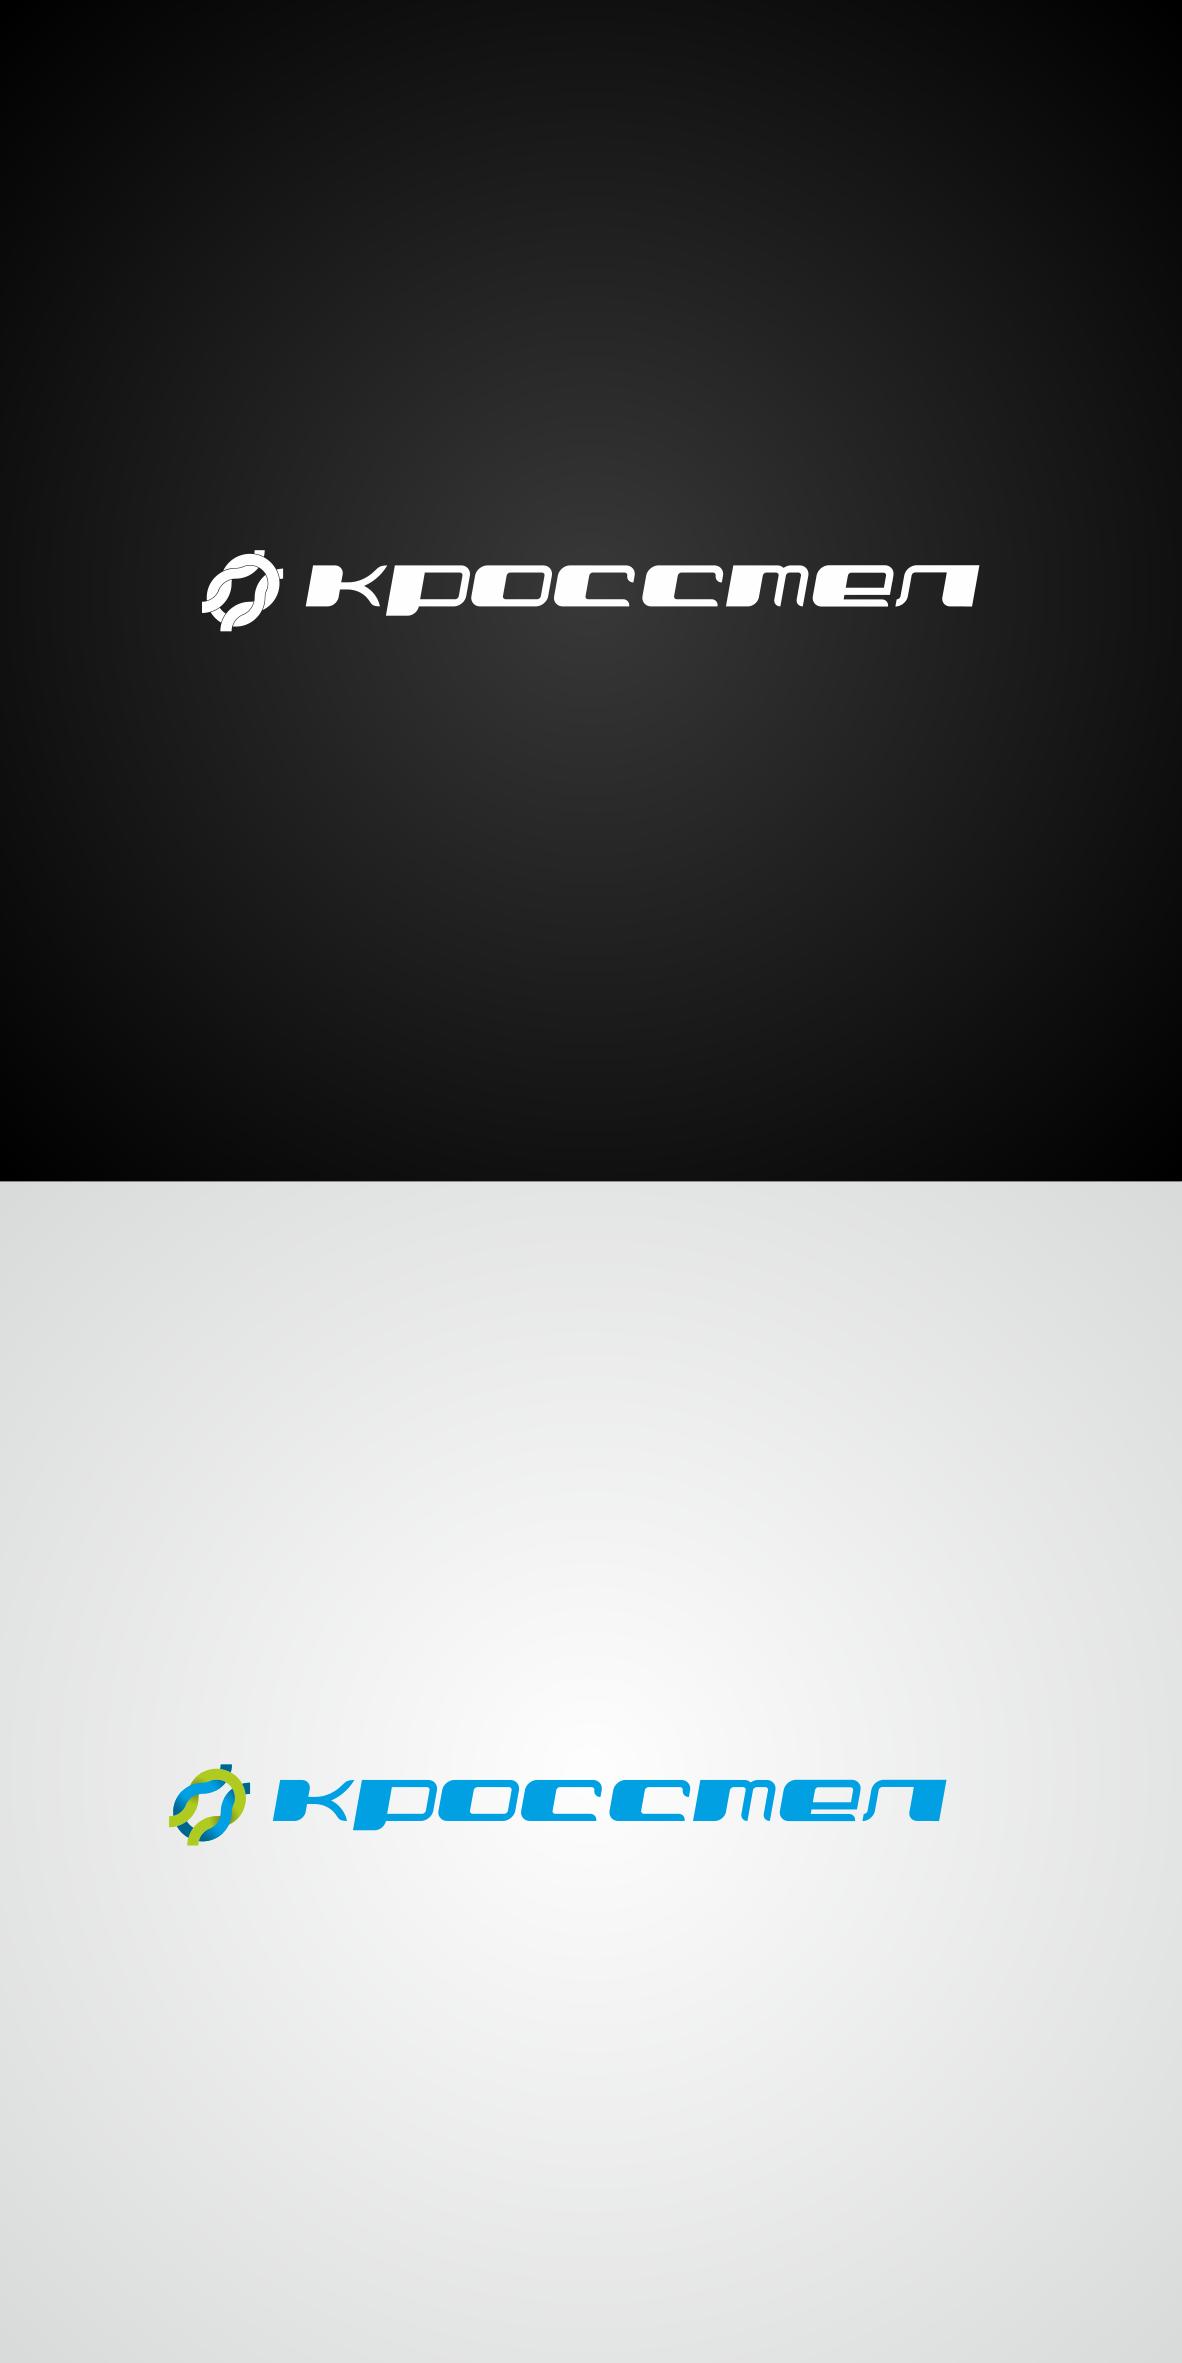 Логотип для компании оператора связи фото f_4eeedad8126e5.png